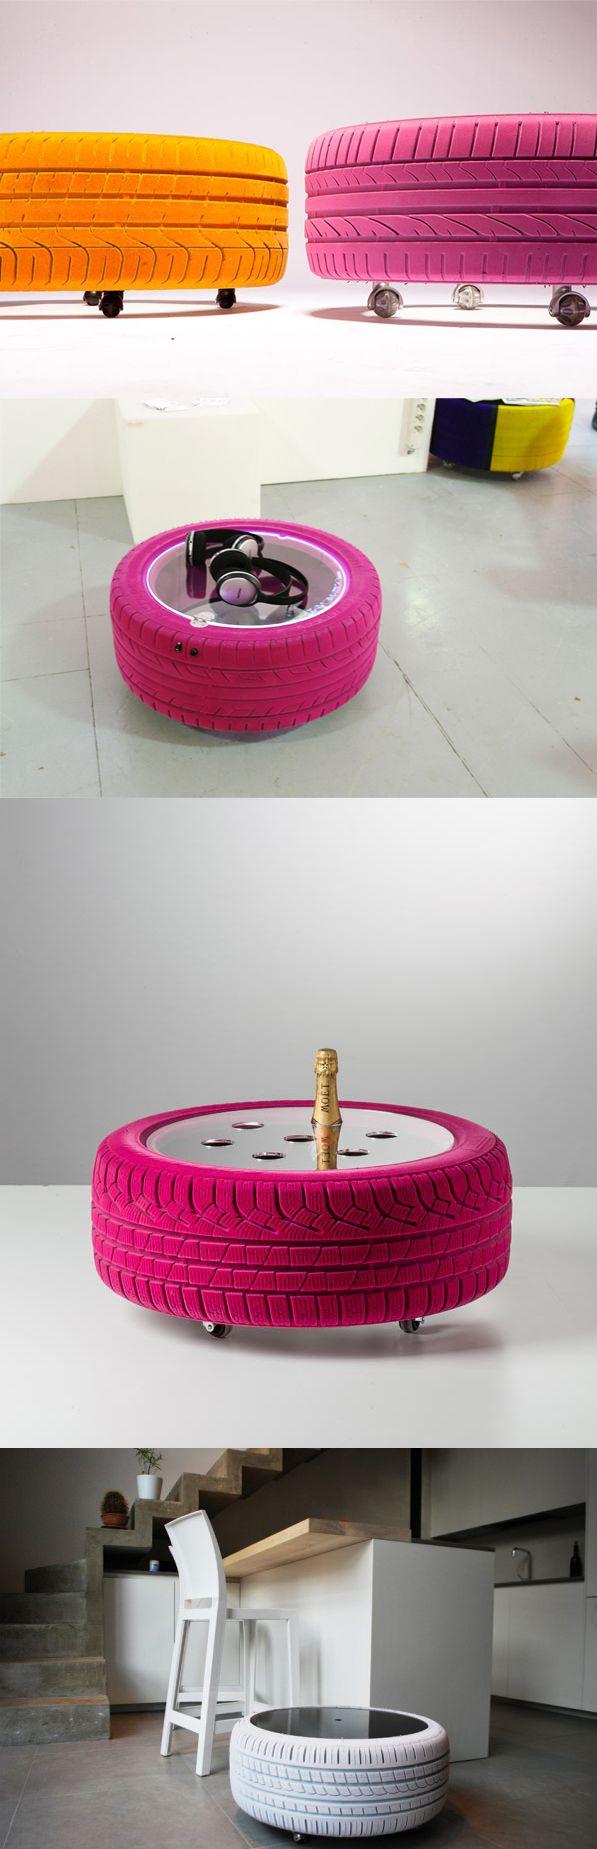 Table en pneus